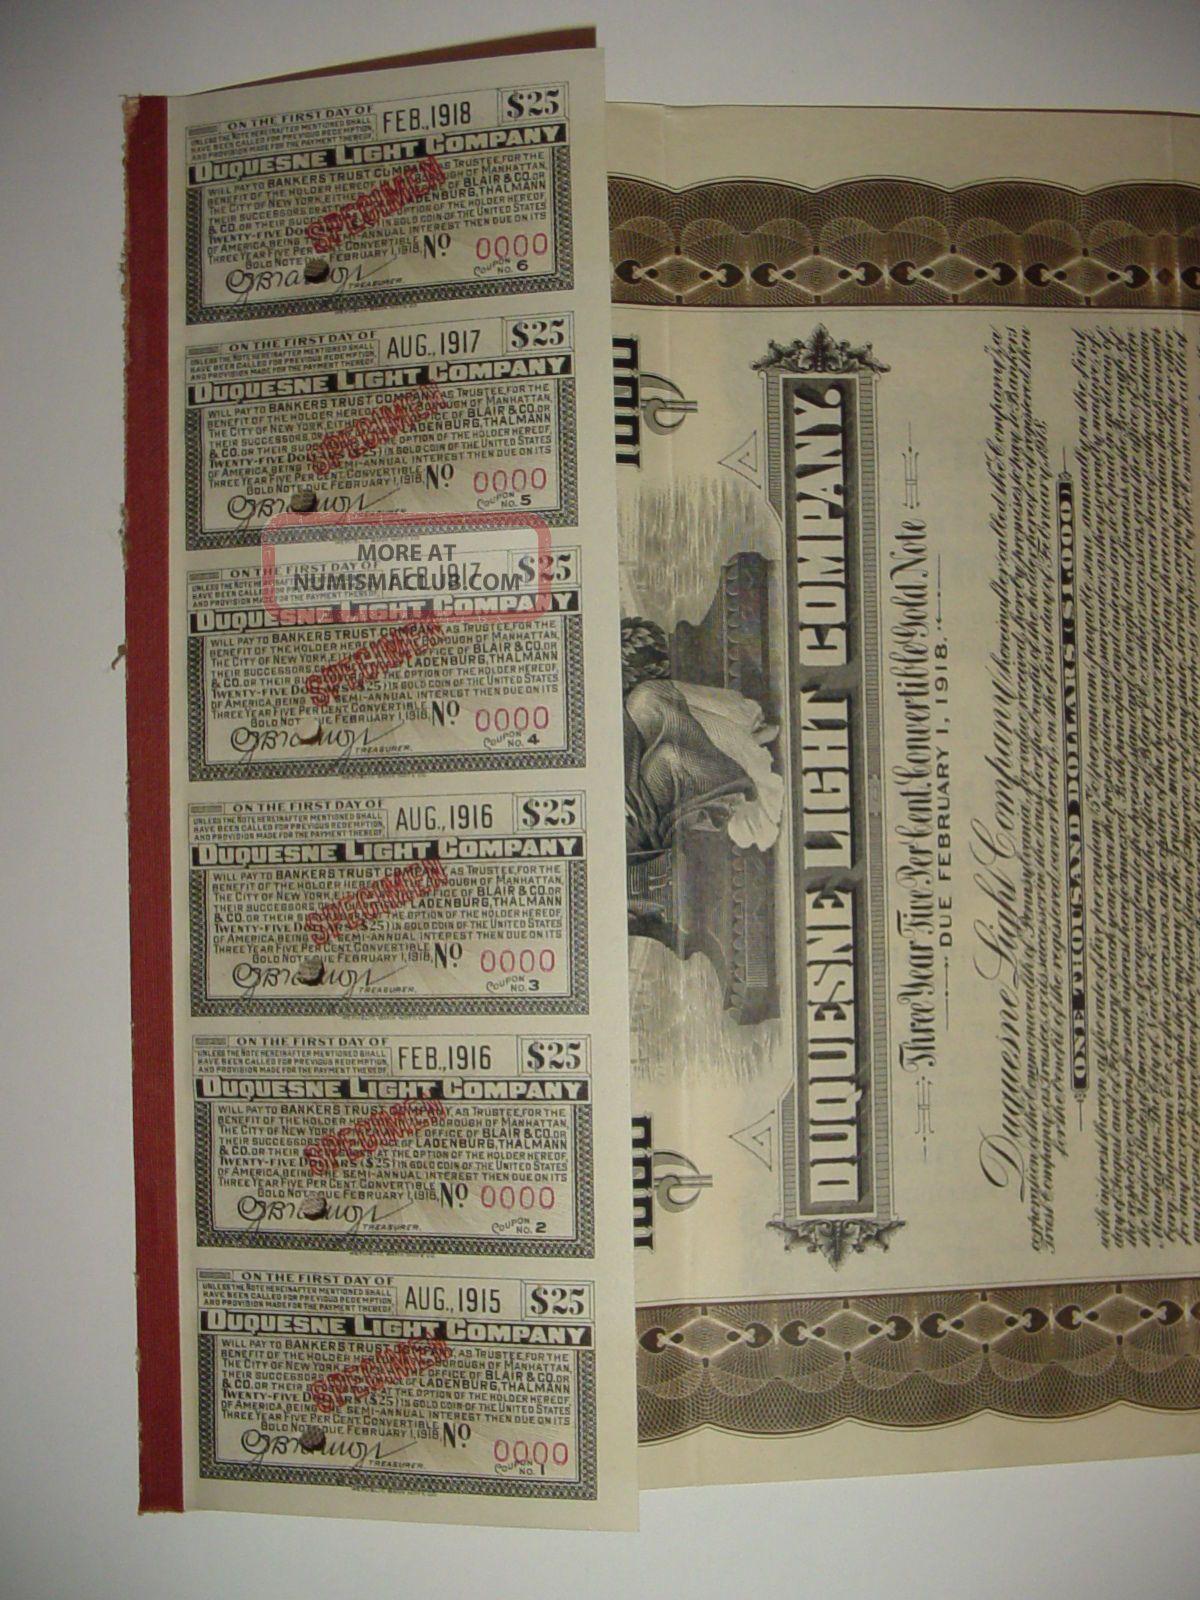 1915 Duquesne Light Company Specimen Bond Certificate Stock Pennsylvania Stocks & Bonds, Scripophily photo